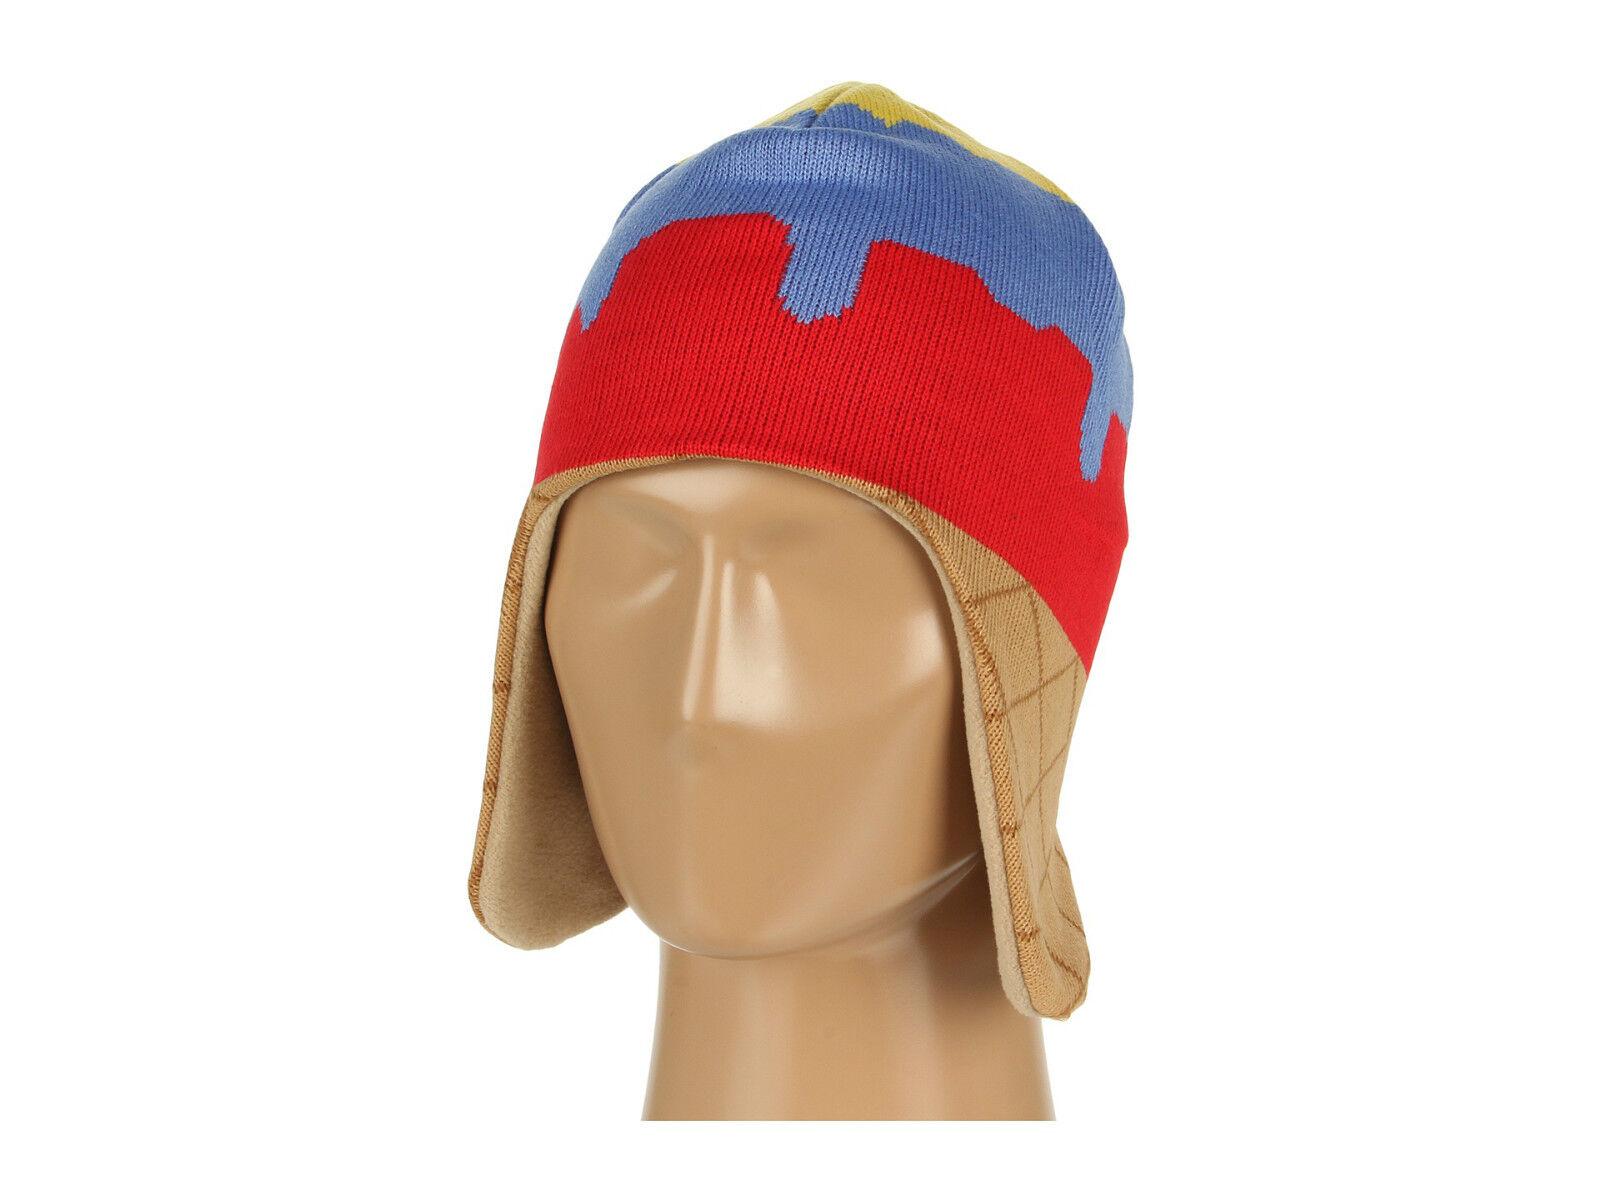 1027e1750cb Neff Ice Cream Cone Beanie Hat Stocking Cap Primary Colored Colors for sale  online